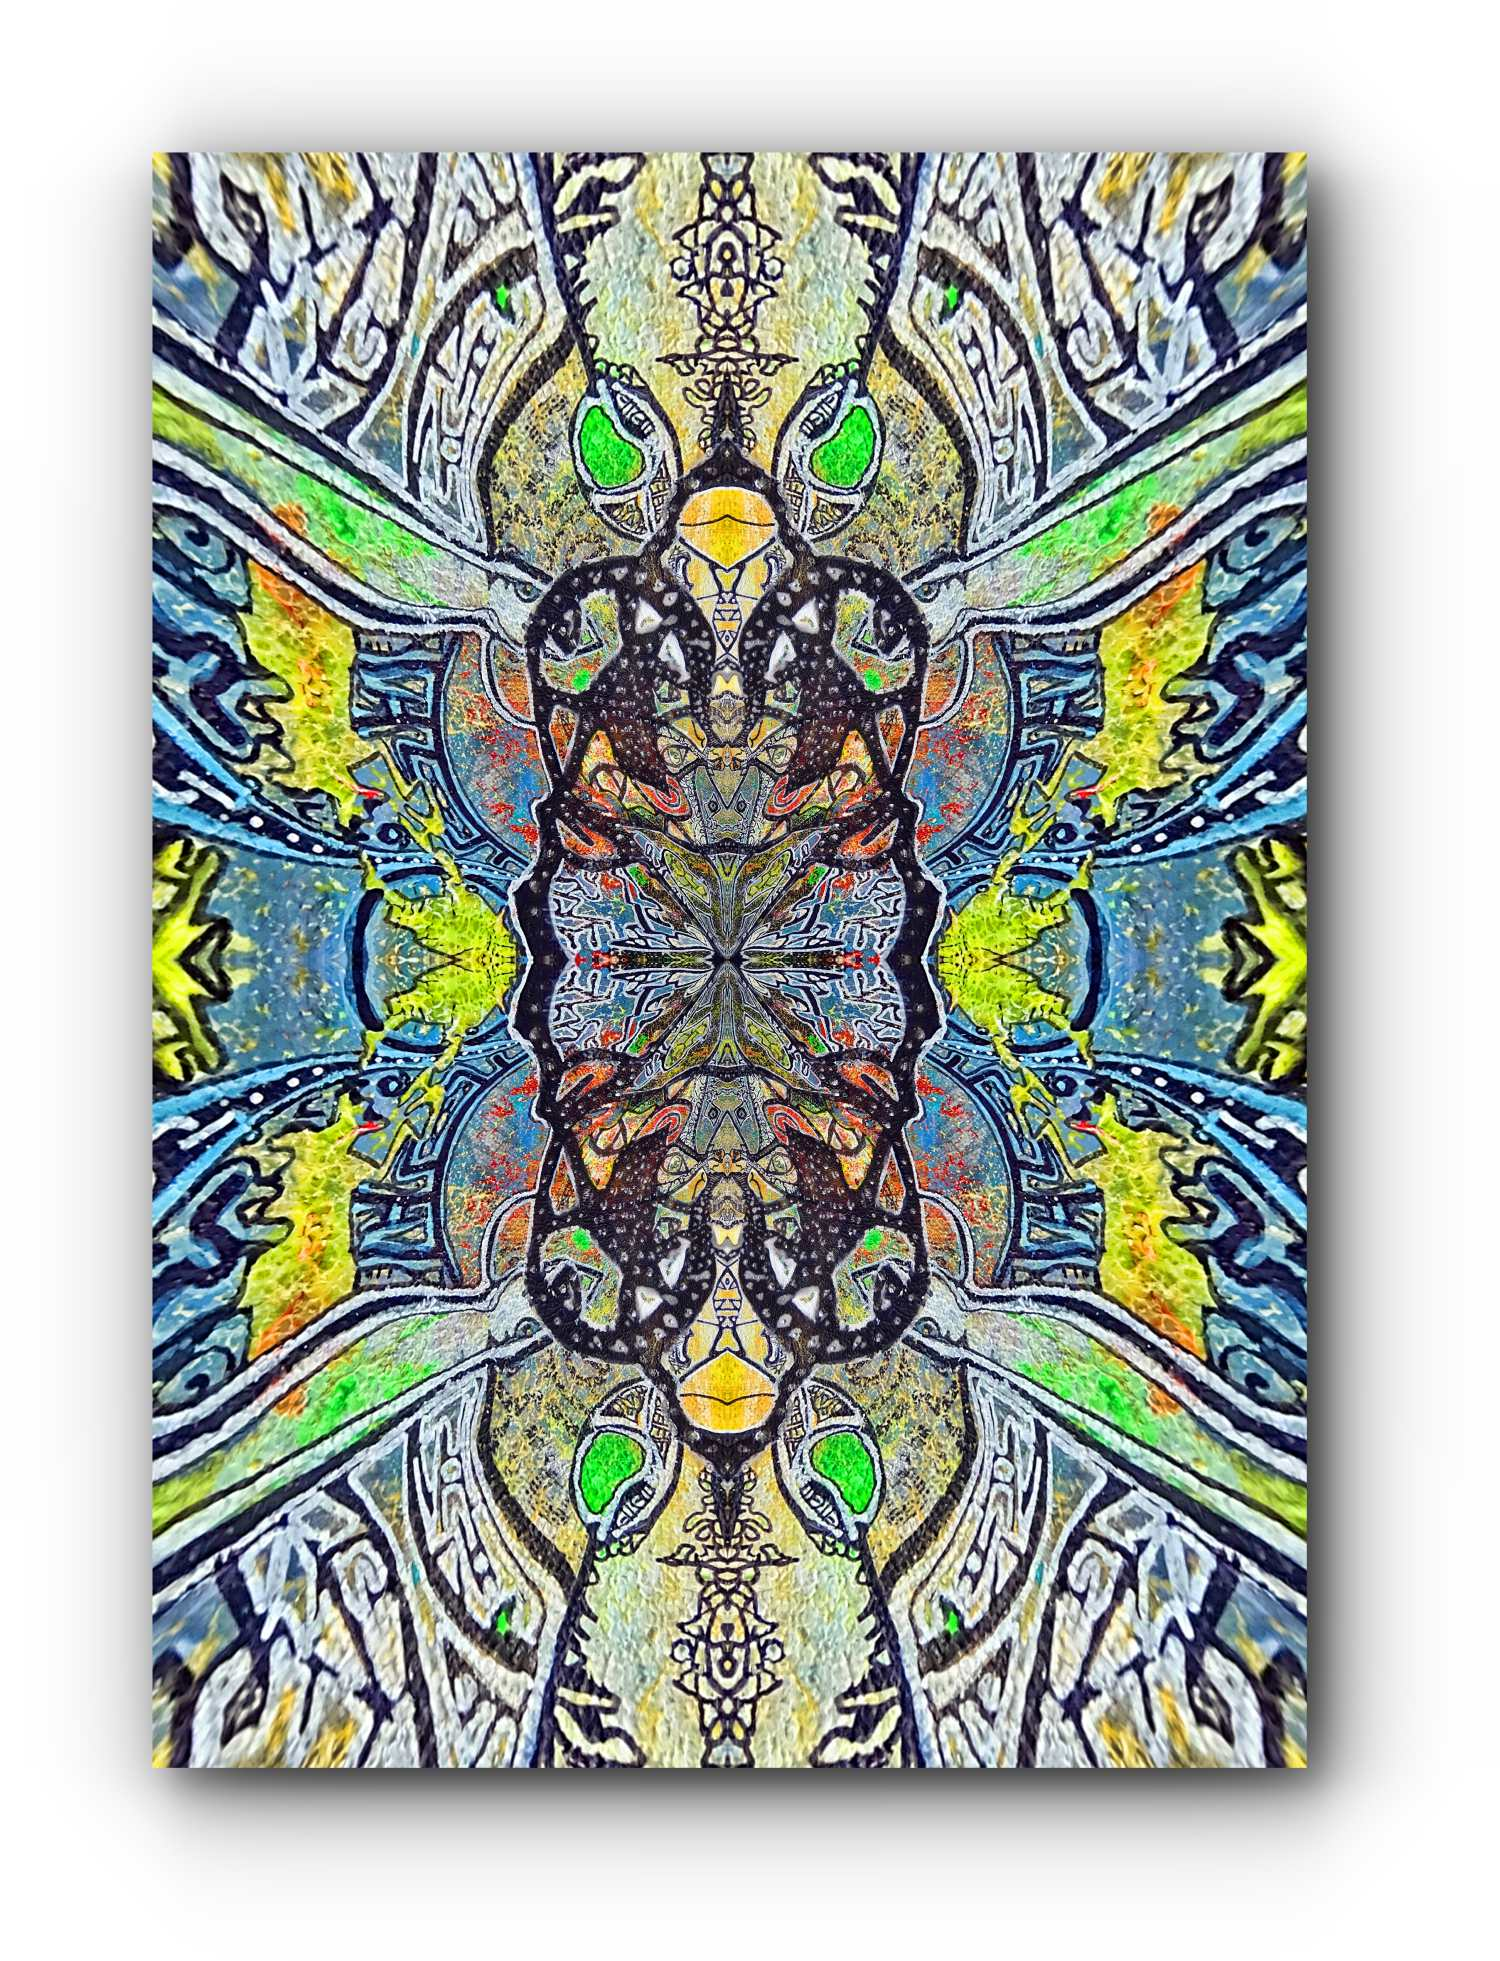 digital-art-facing-horus-artist-duo-ingress-vortices.jpg